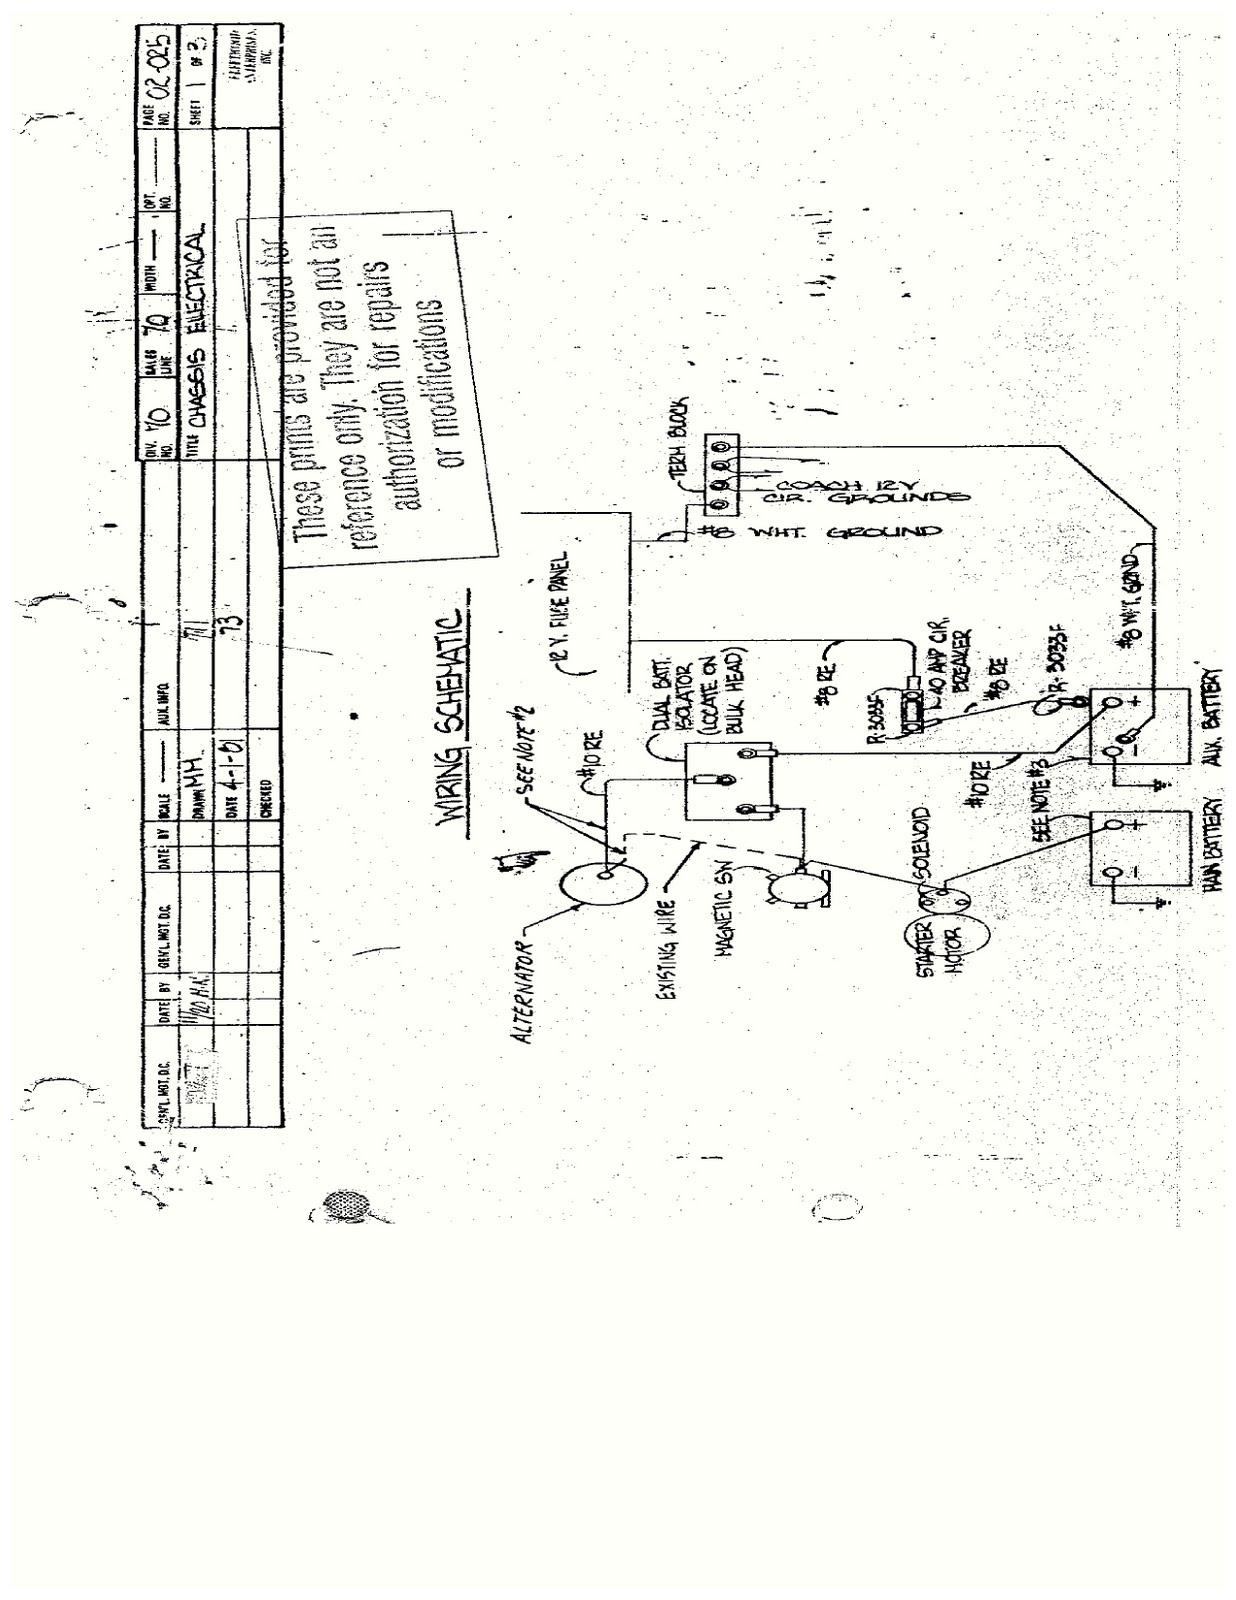 medium resolution of 1984 pontiac fiero fuse box diagram 1986 pontiac fiero 97 chevy p30 dashboard 97 chevy malibu